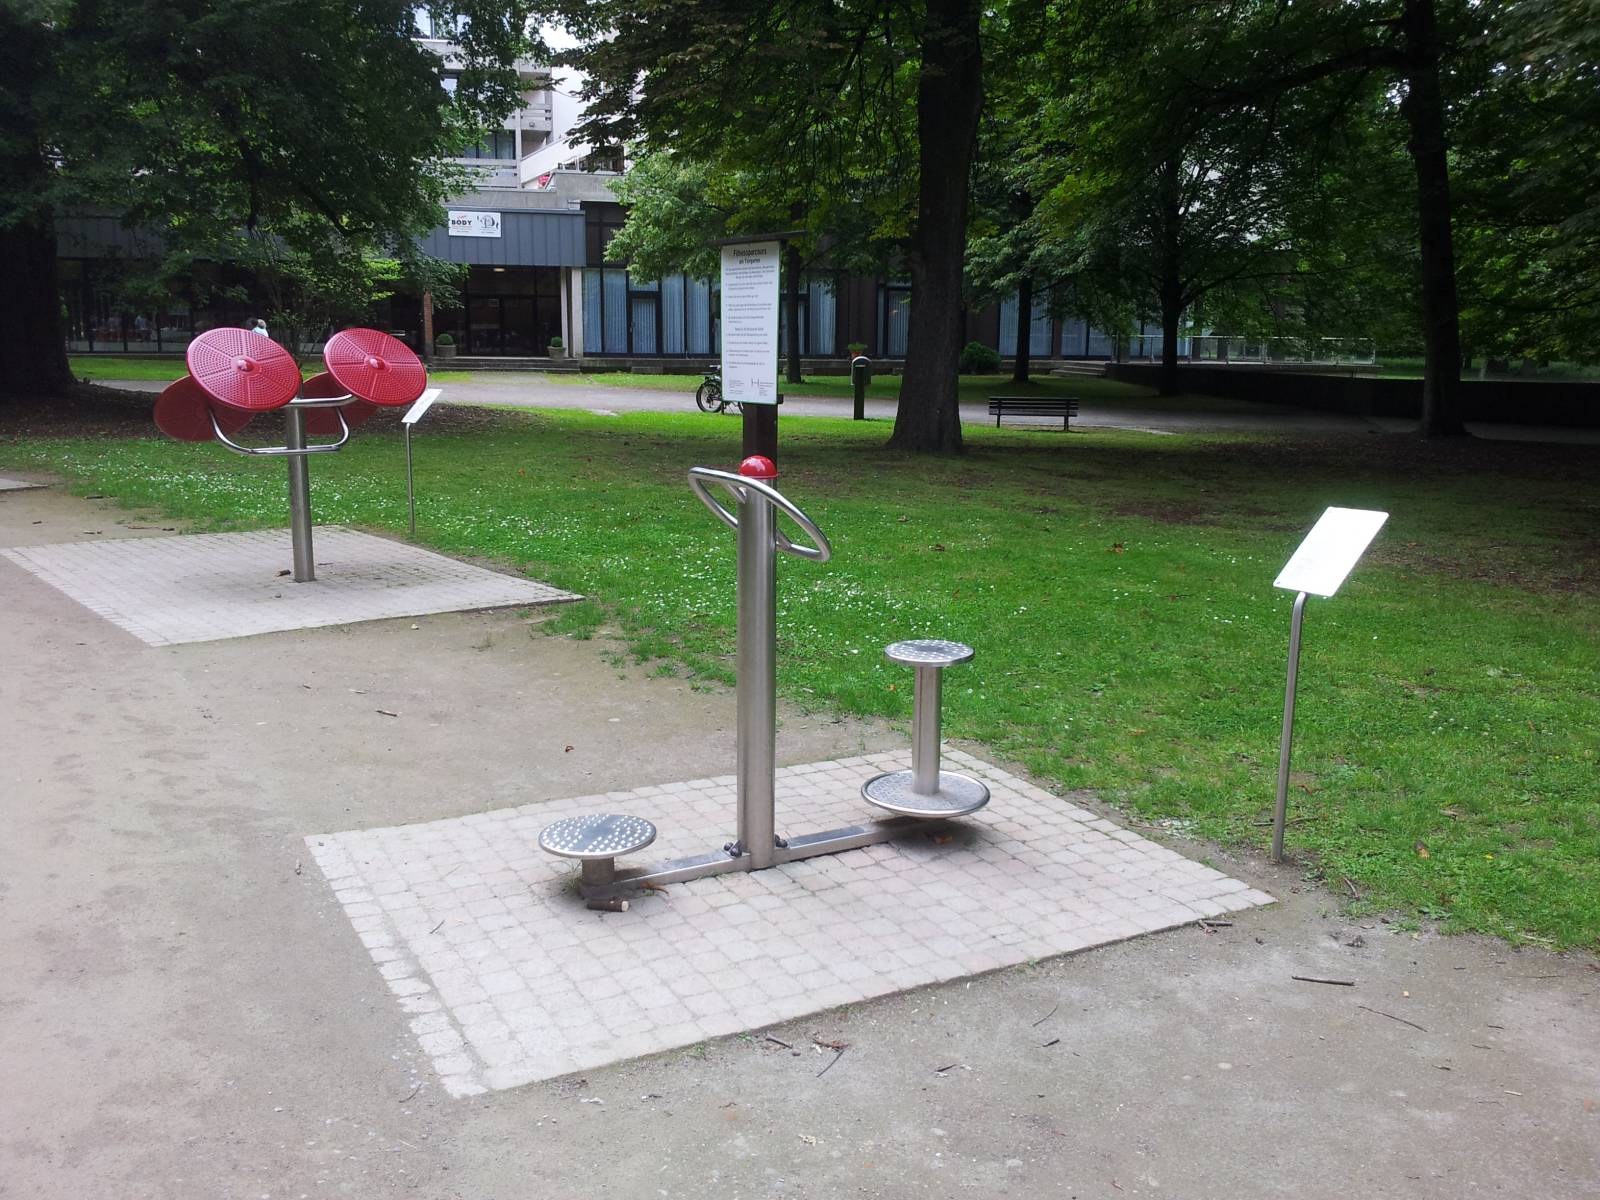 Spielplatz Am Tiergarten in Hannover, Kirchrode   spielplatznet.de